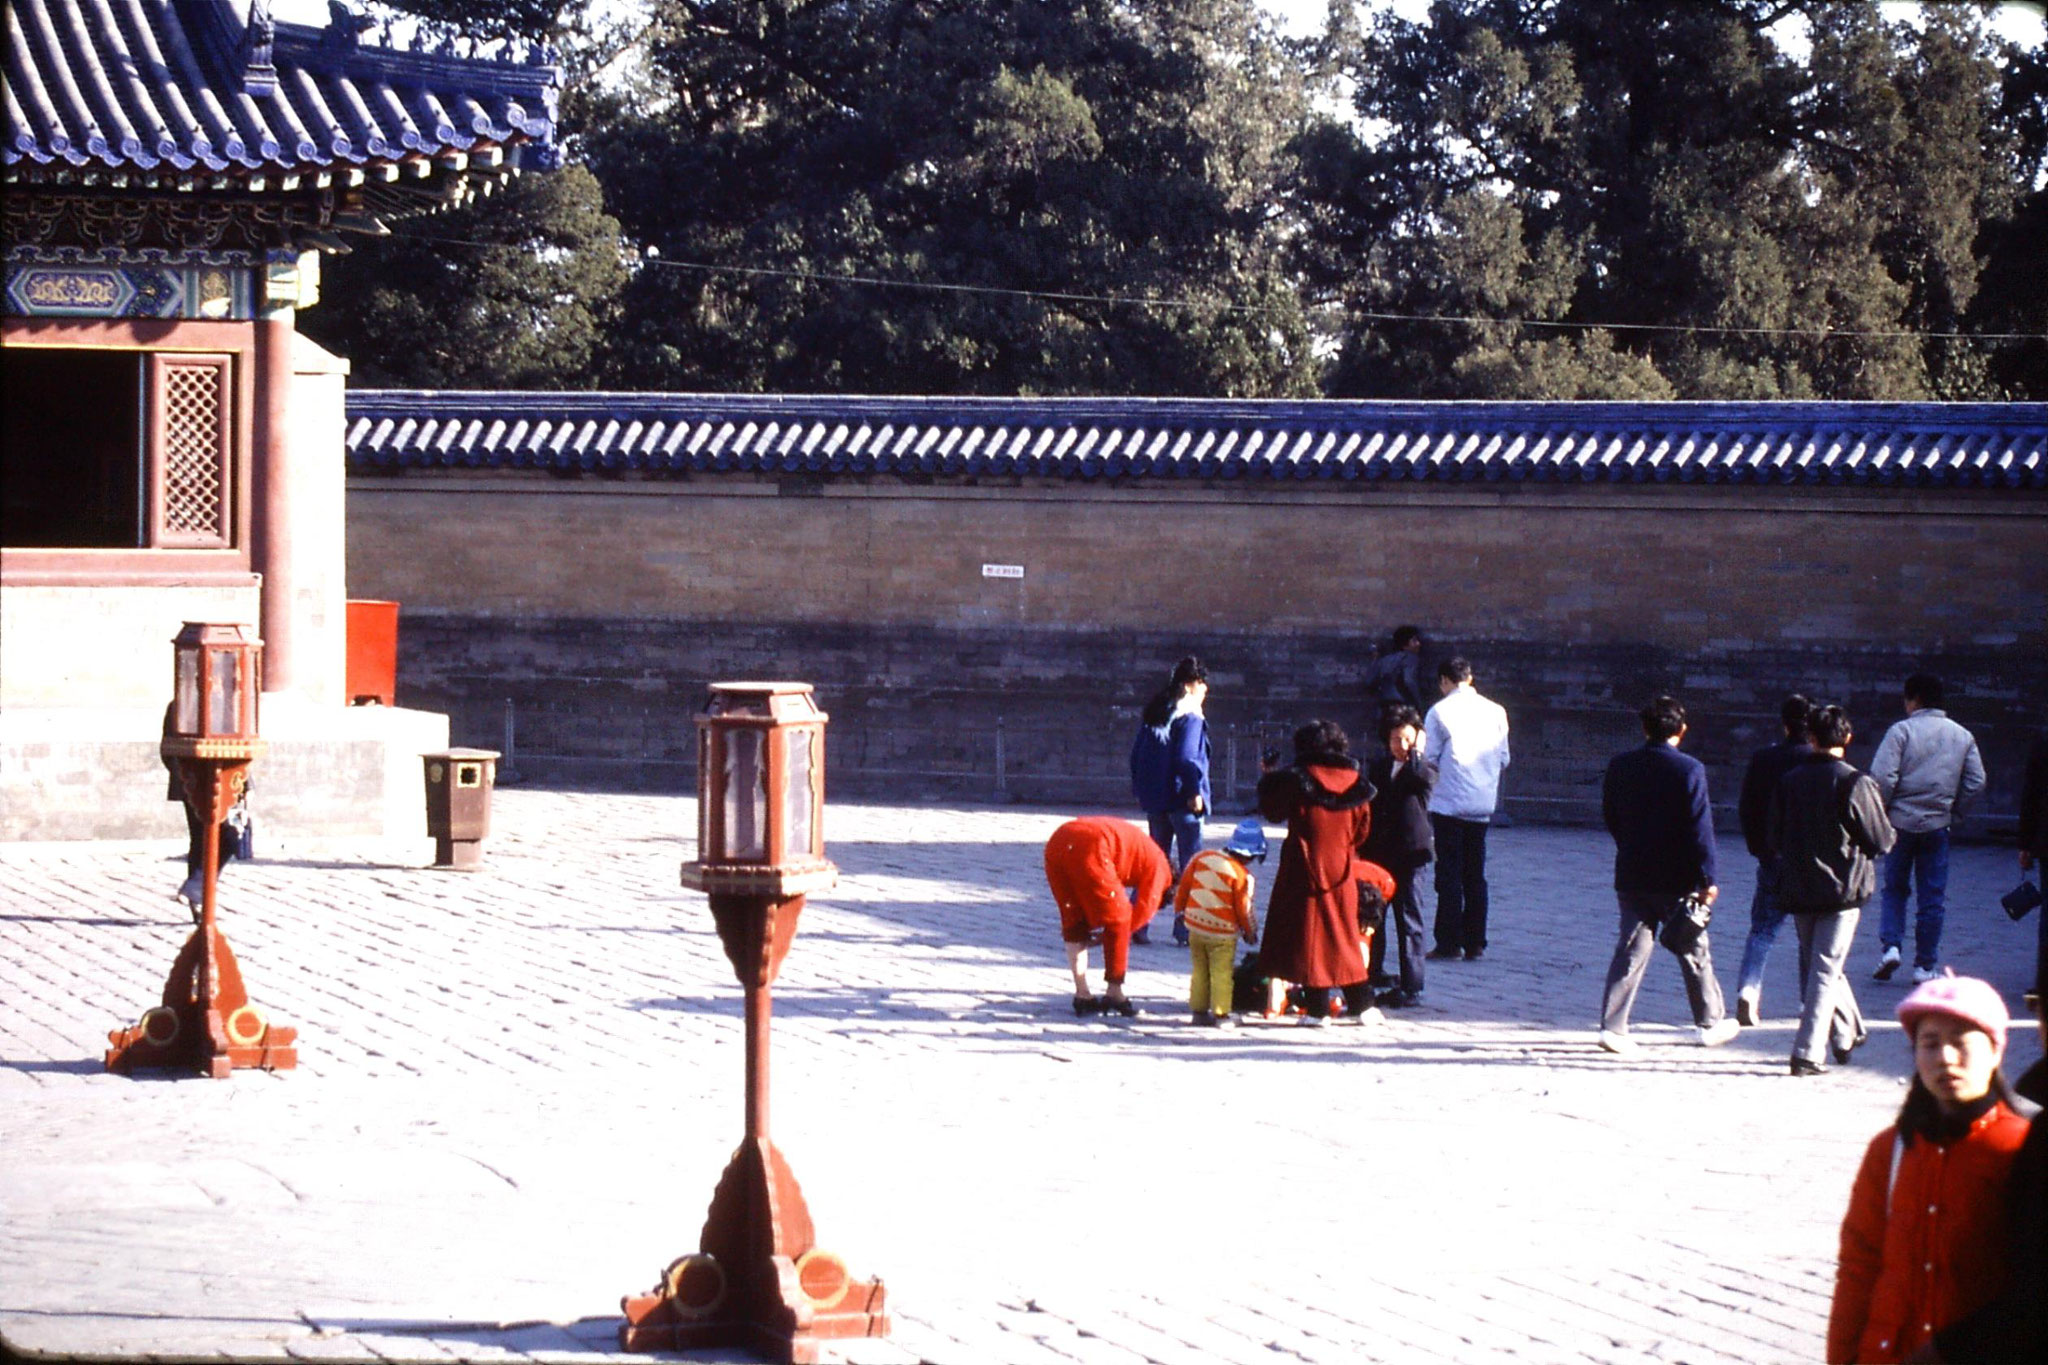 2/12/1988: 17: Tiantan Park